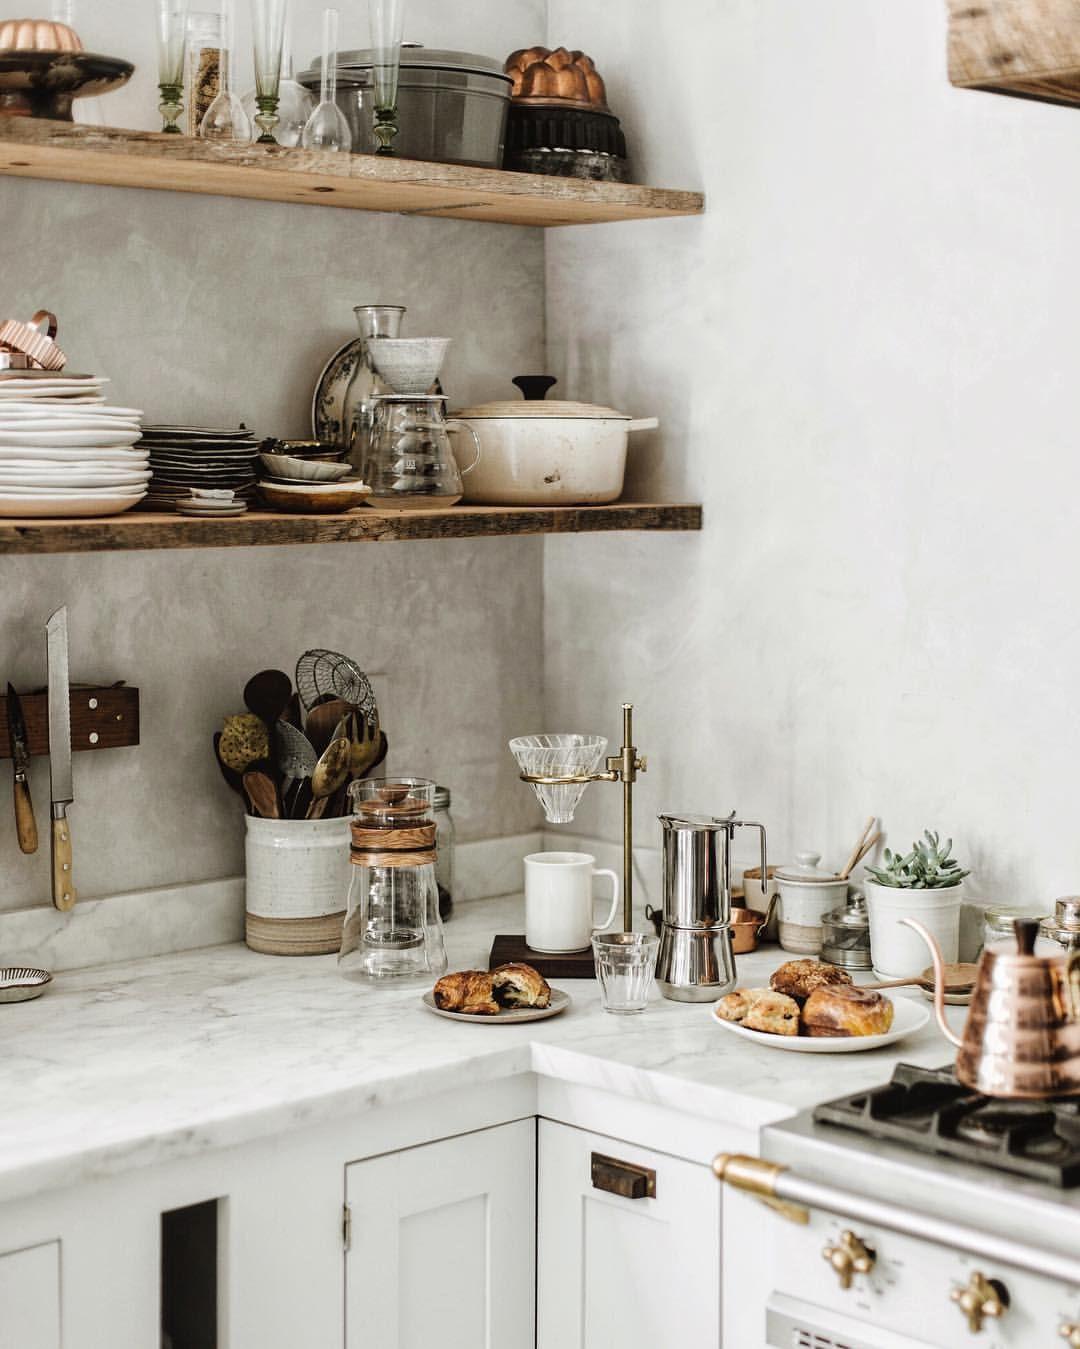 Rustic Kitchen Jobs: @tifforelieのInstagram写真をチェック • いいね!11.9千件